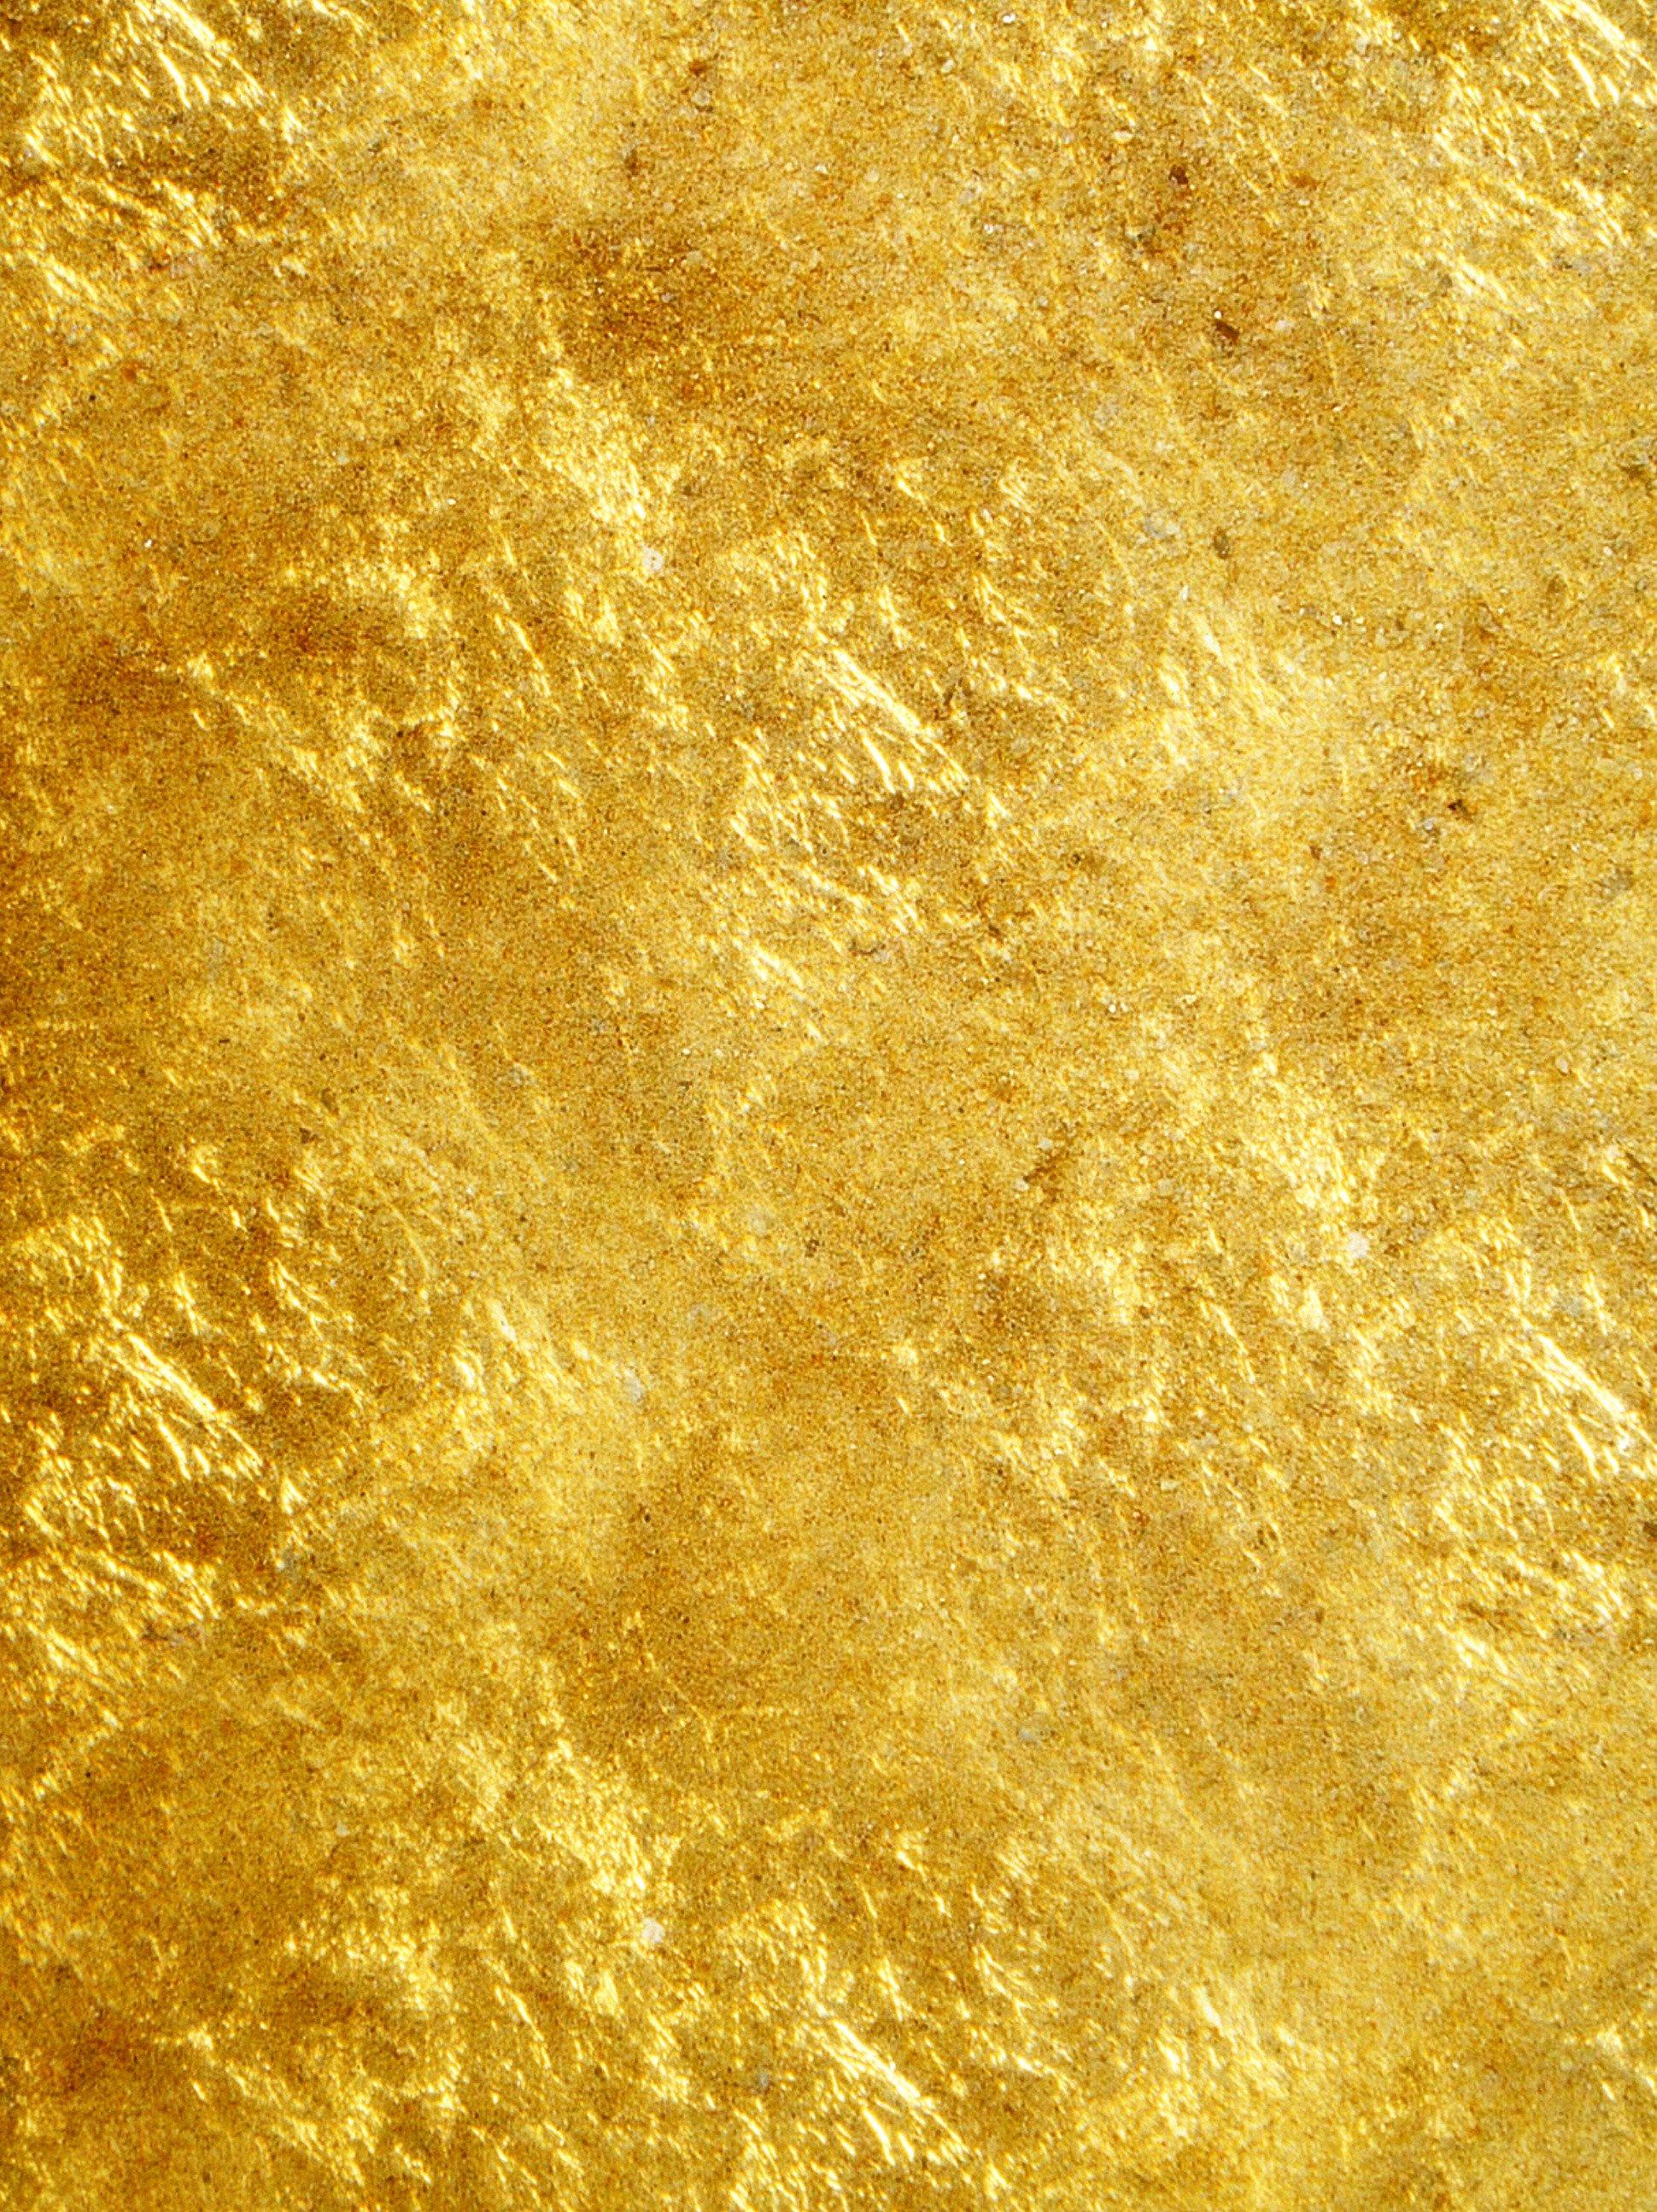 Gold Foil Texture Free 1000 Images About Goudkleurig On Pinterest